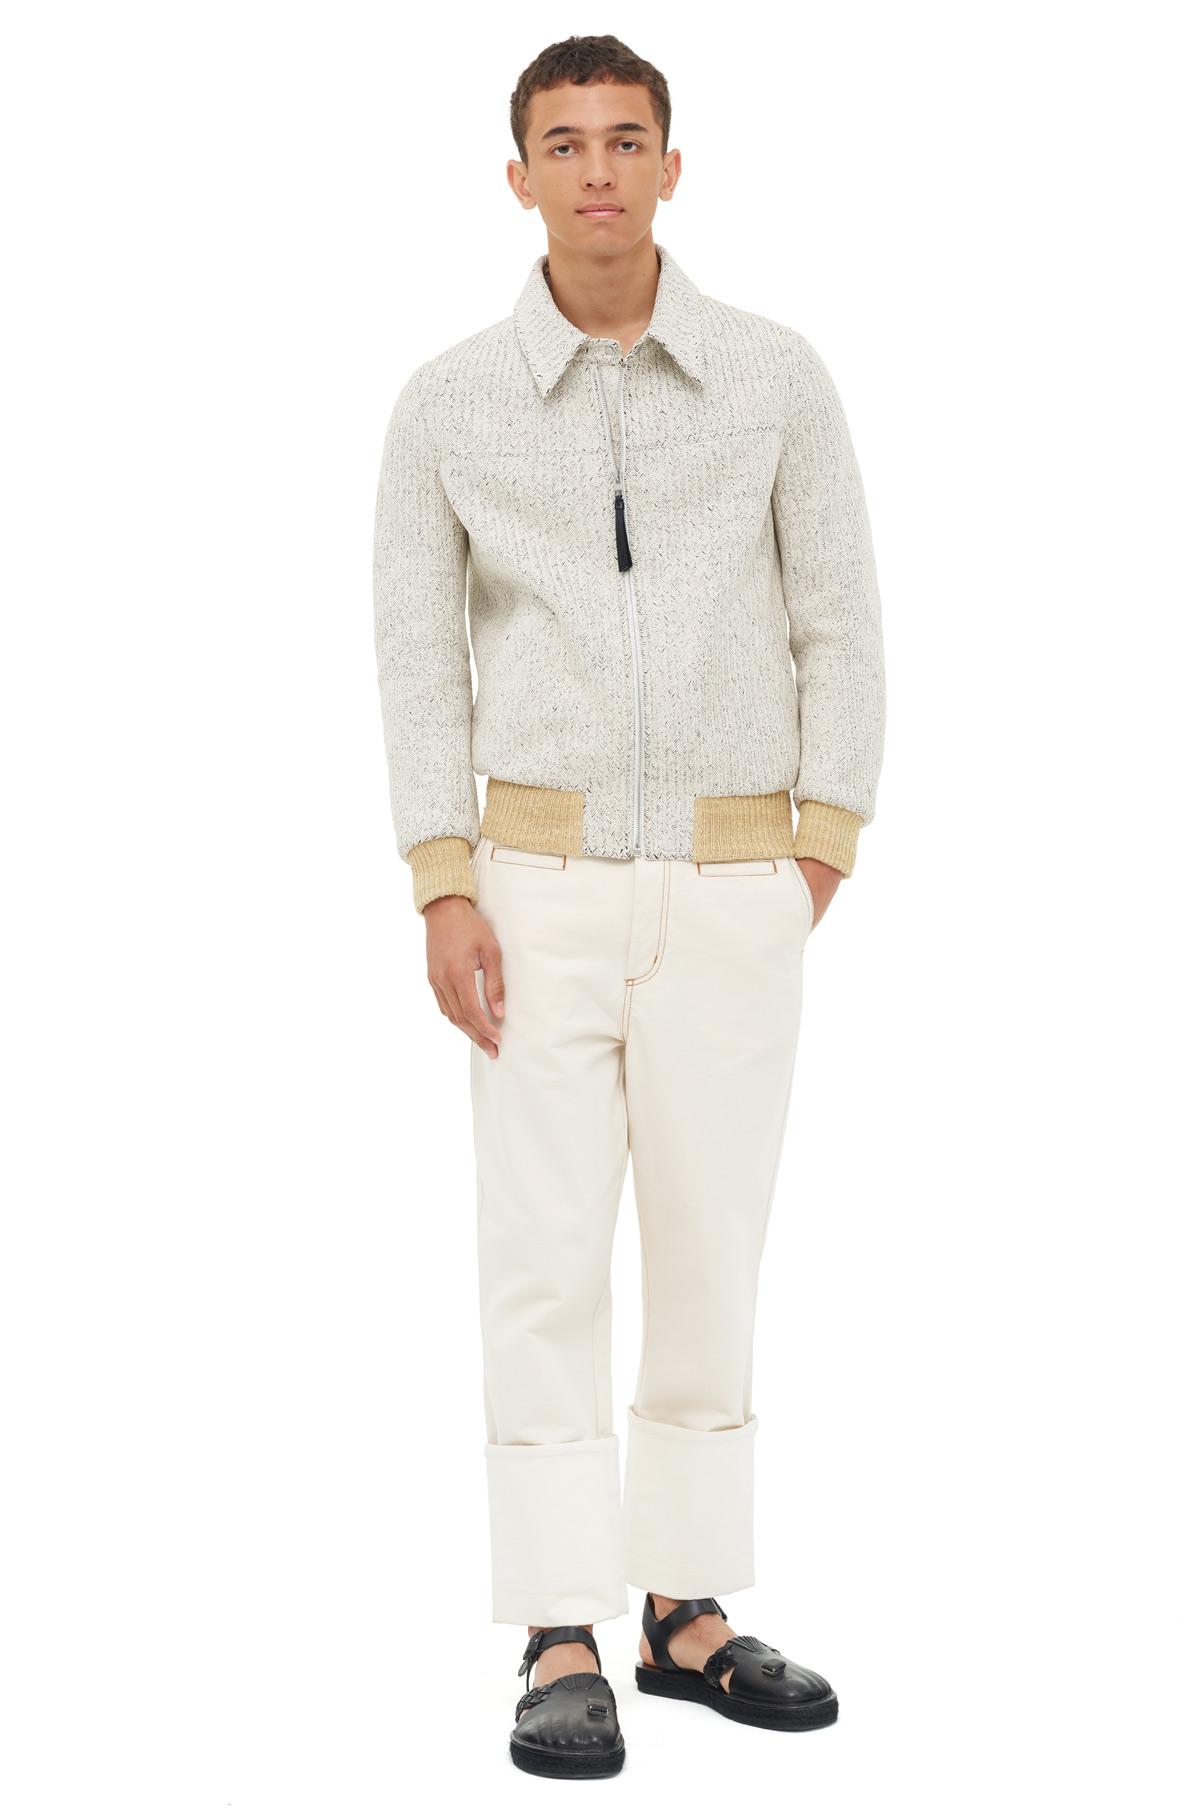 LOEWE Fisherman Jeans ホワイト front